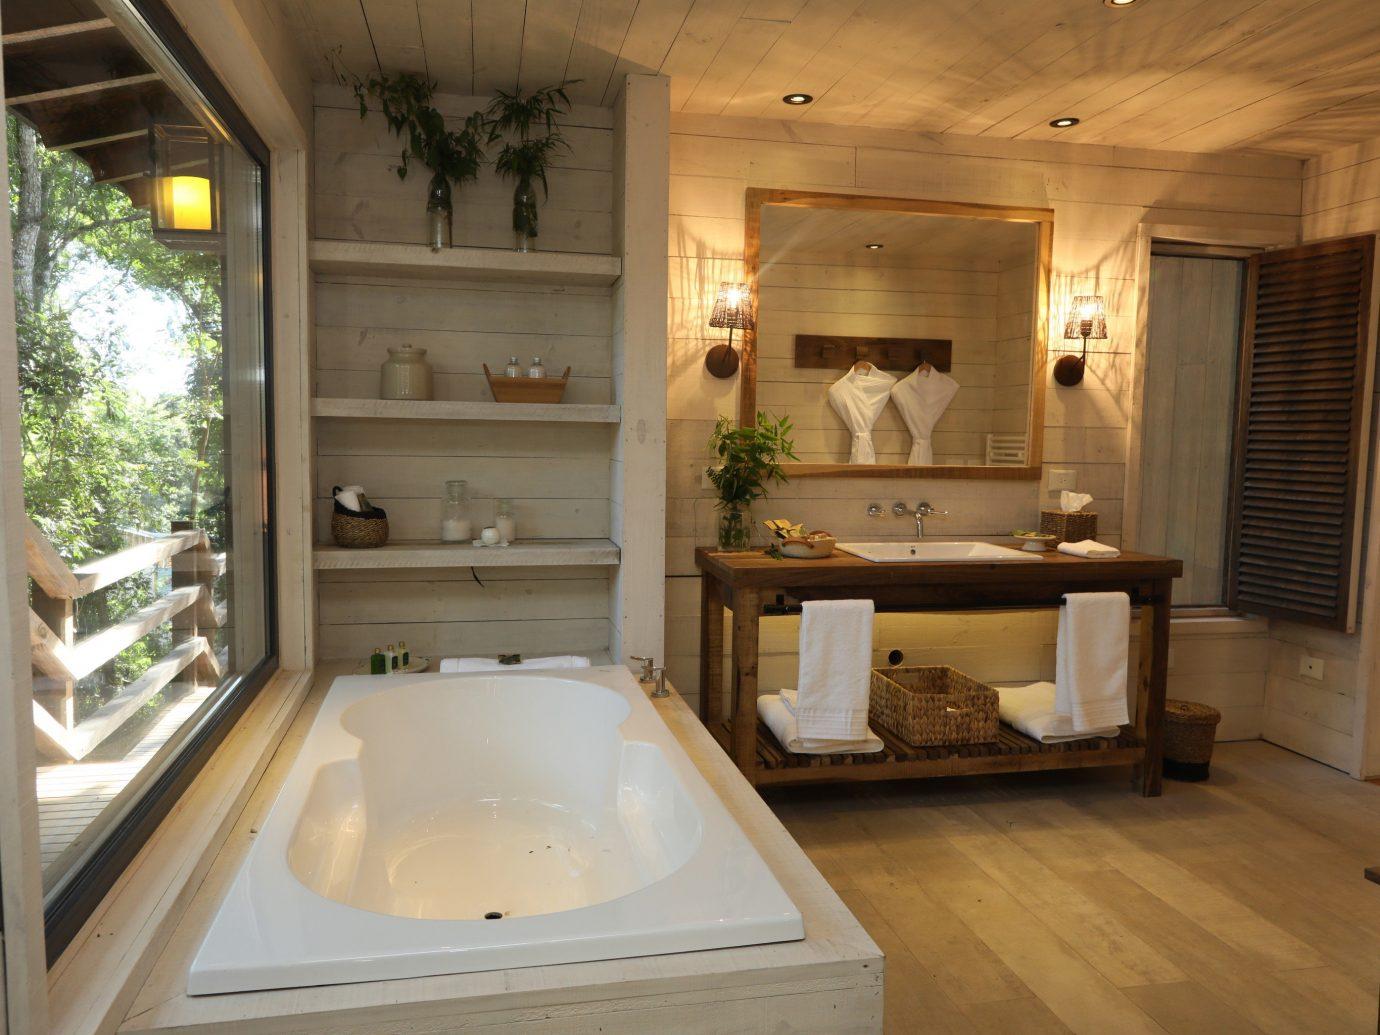 Hotels Outdoors + Adventure indoor window floor room bathroom interior design estate house tub